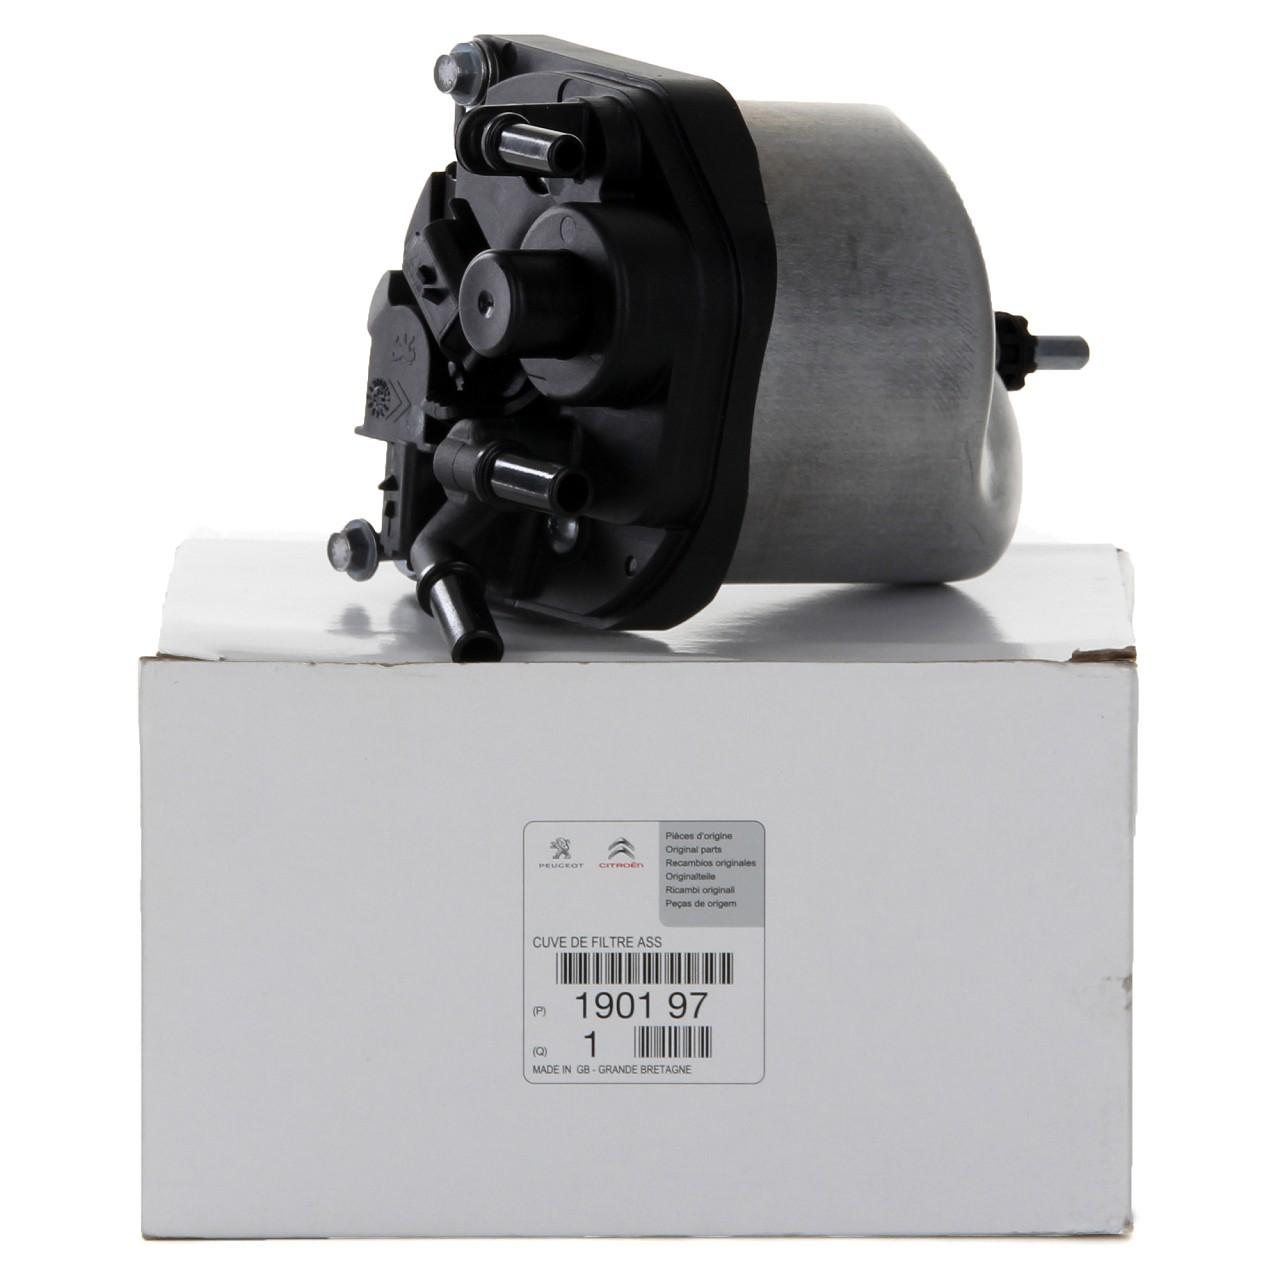 ORIGINAL Citroen Peugeot Kraftstofffilter Dieselfilter 1.4HDi 1.6HDi 1901.97